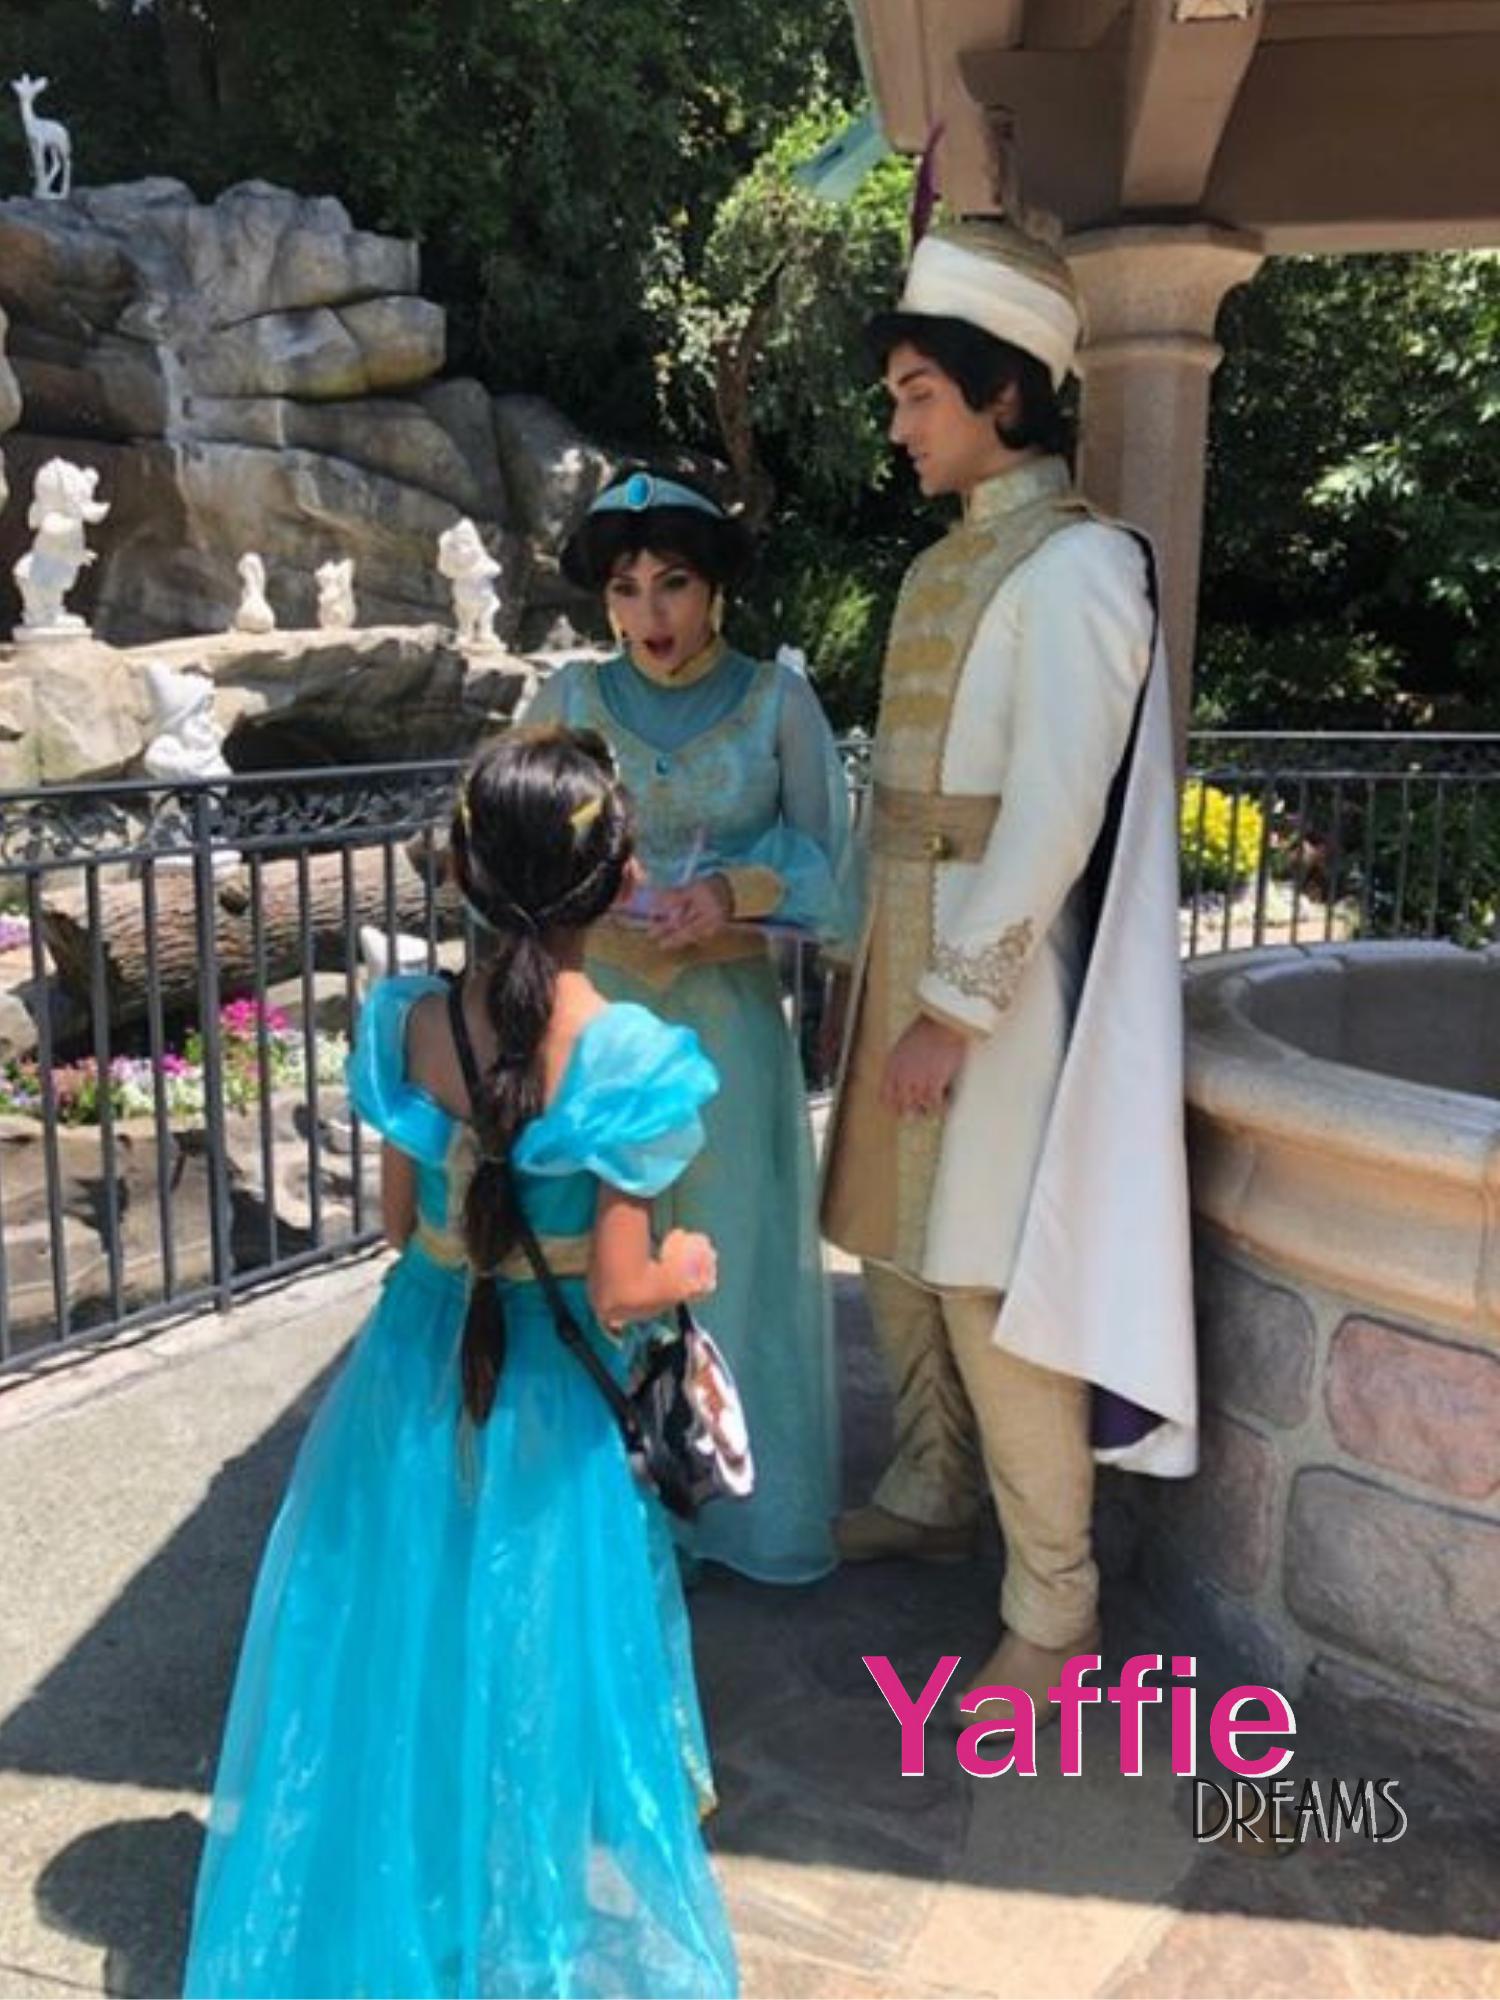 Princess Jasmine costume by YAFFIE DREAMS store Aladdin 2019